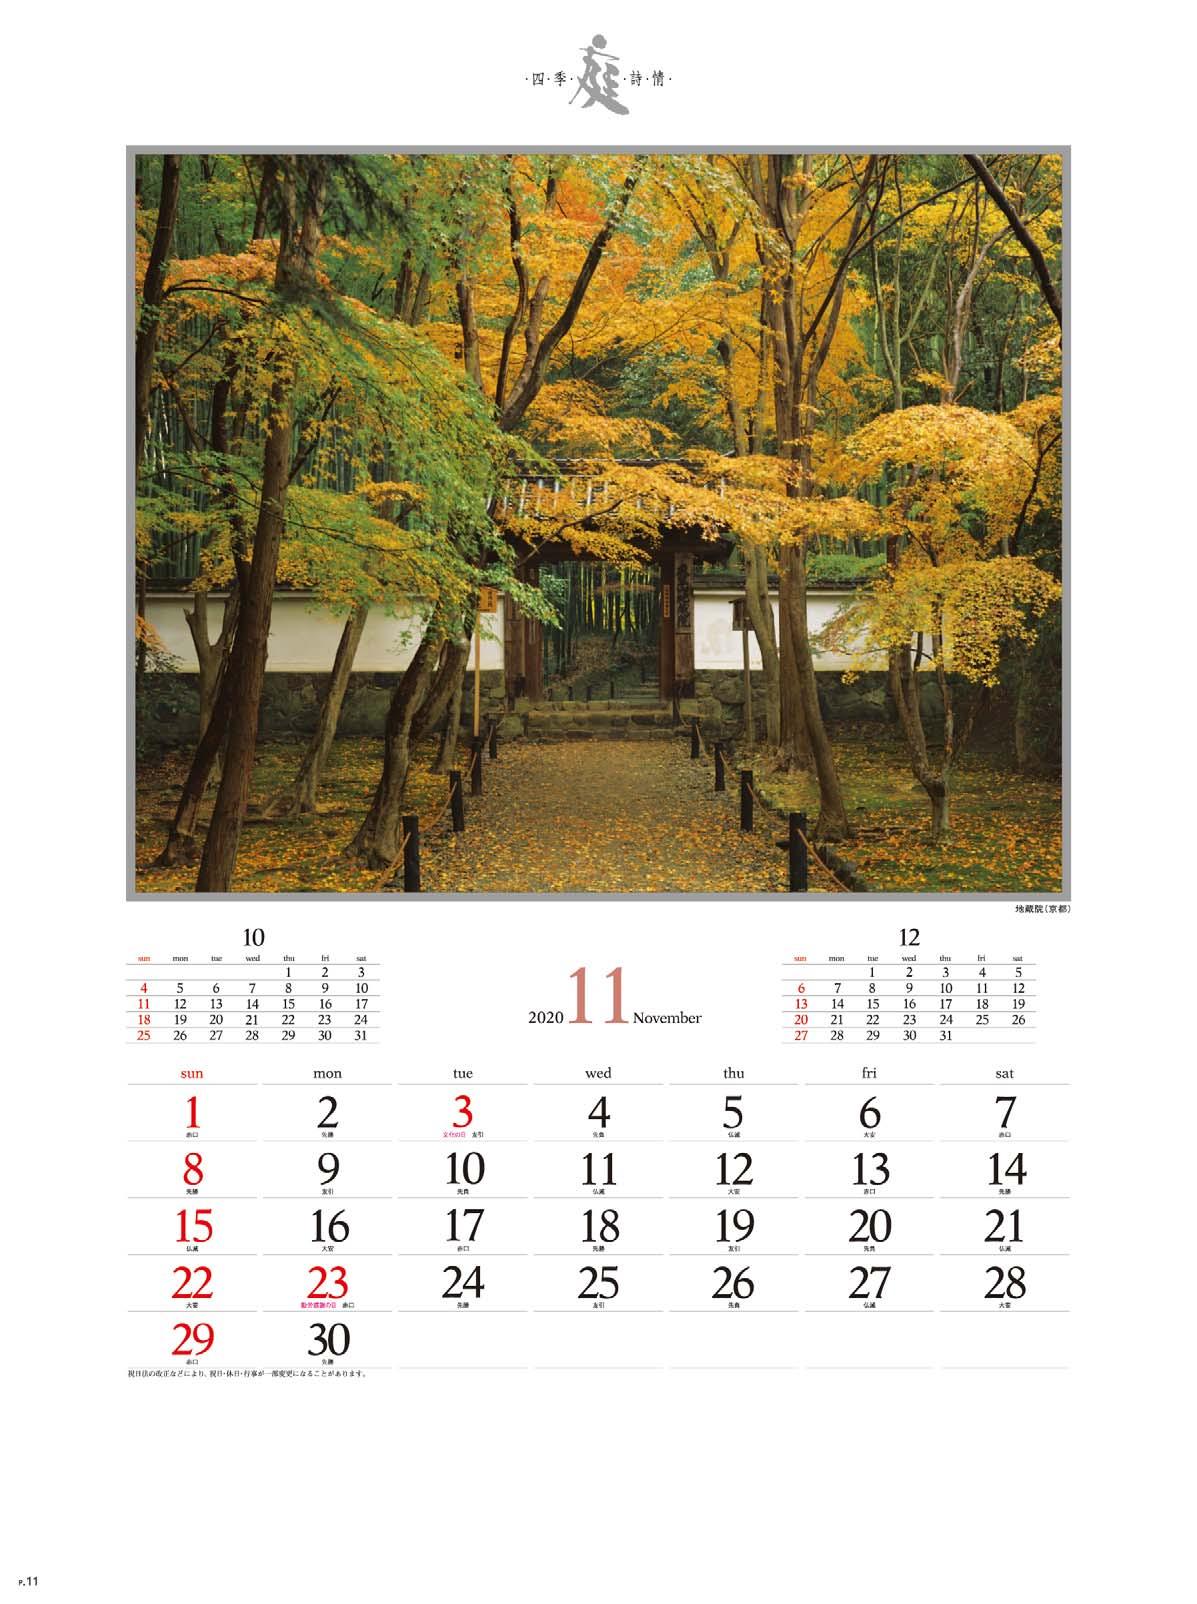 画像:地蔵院(京都) 庭・四季詩情 2020年カレンダー